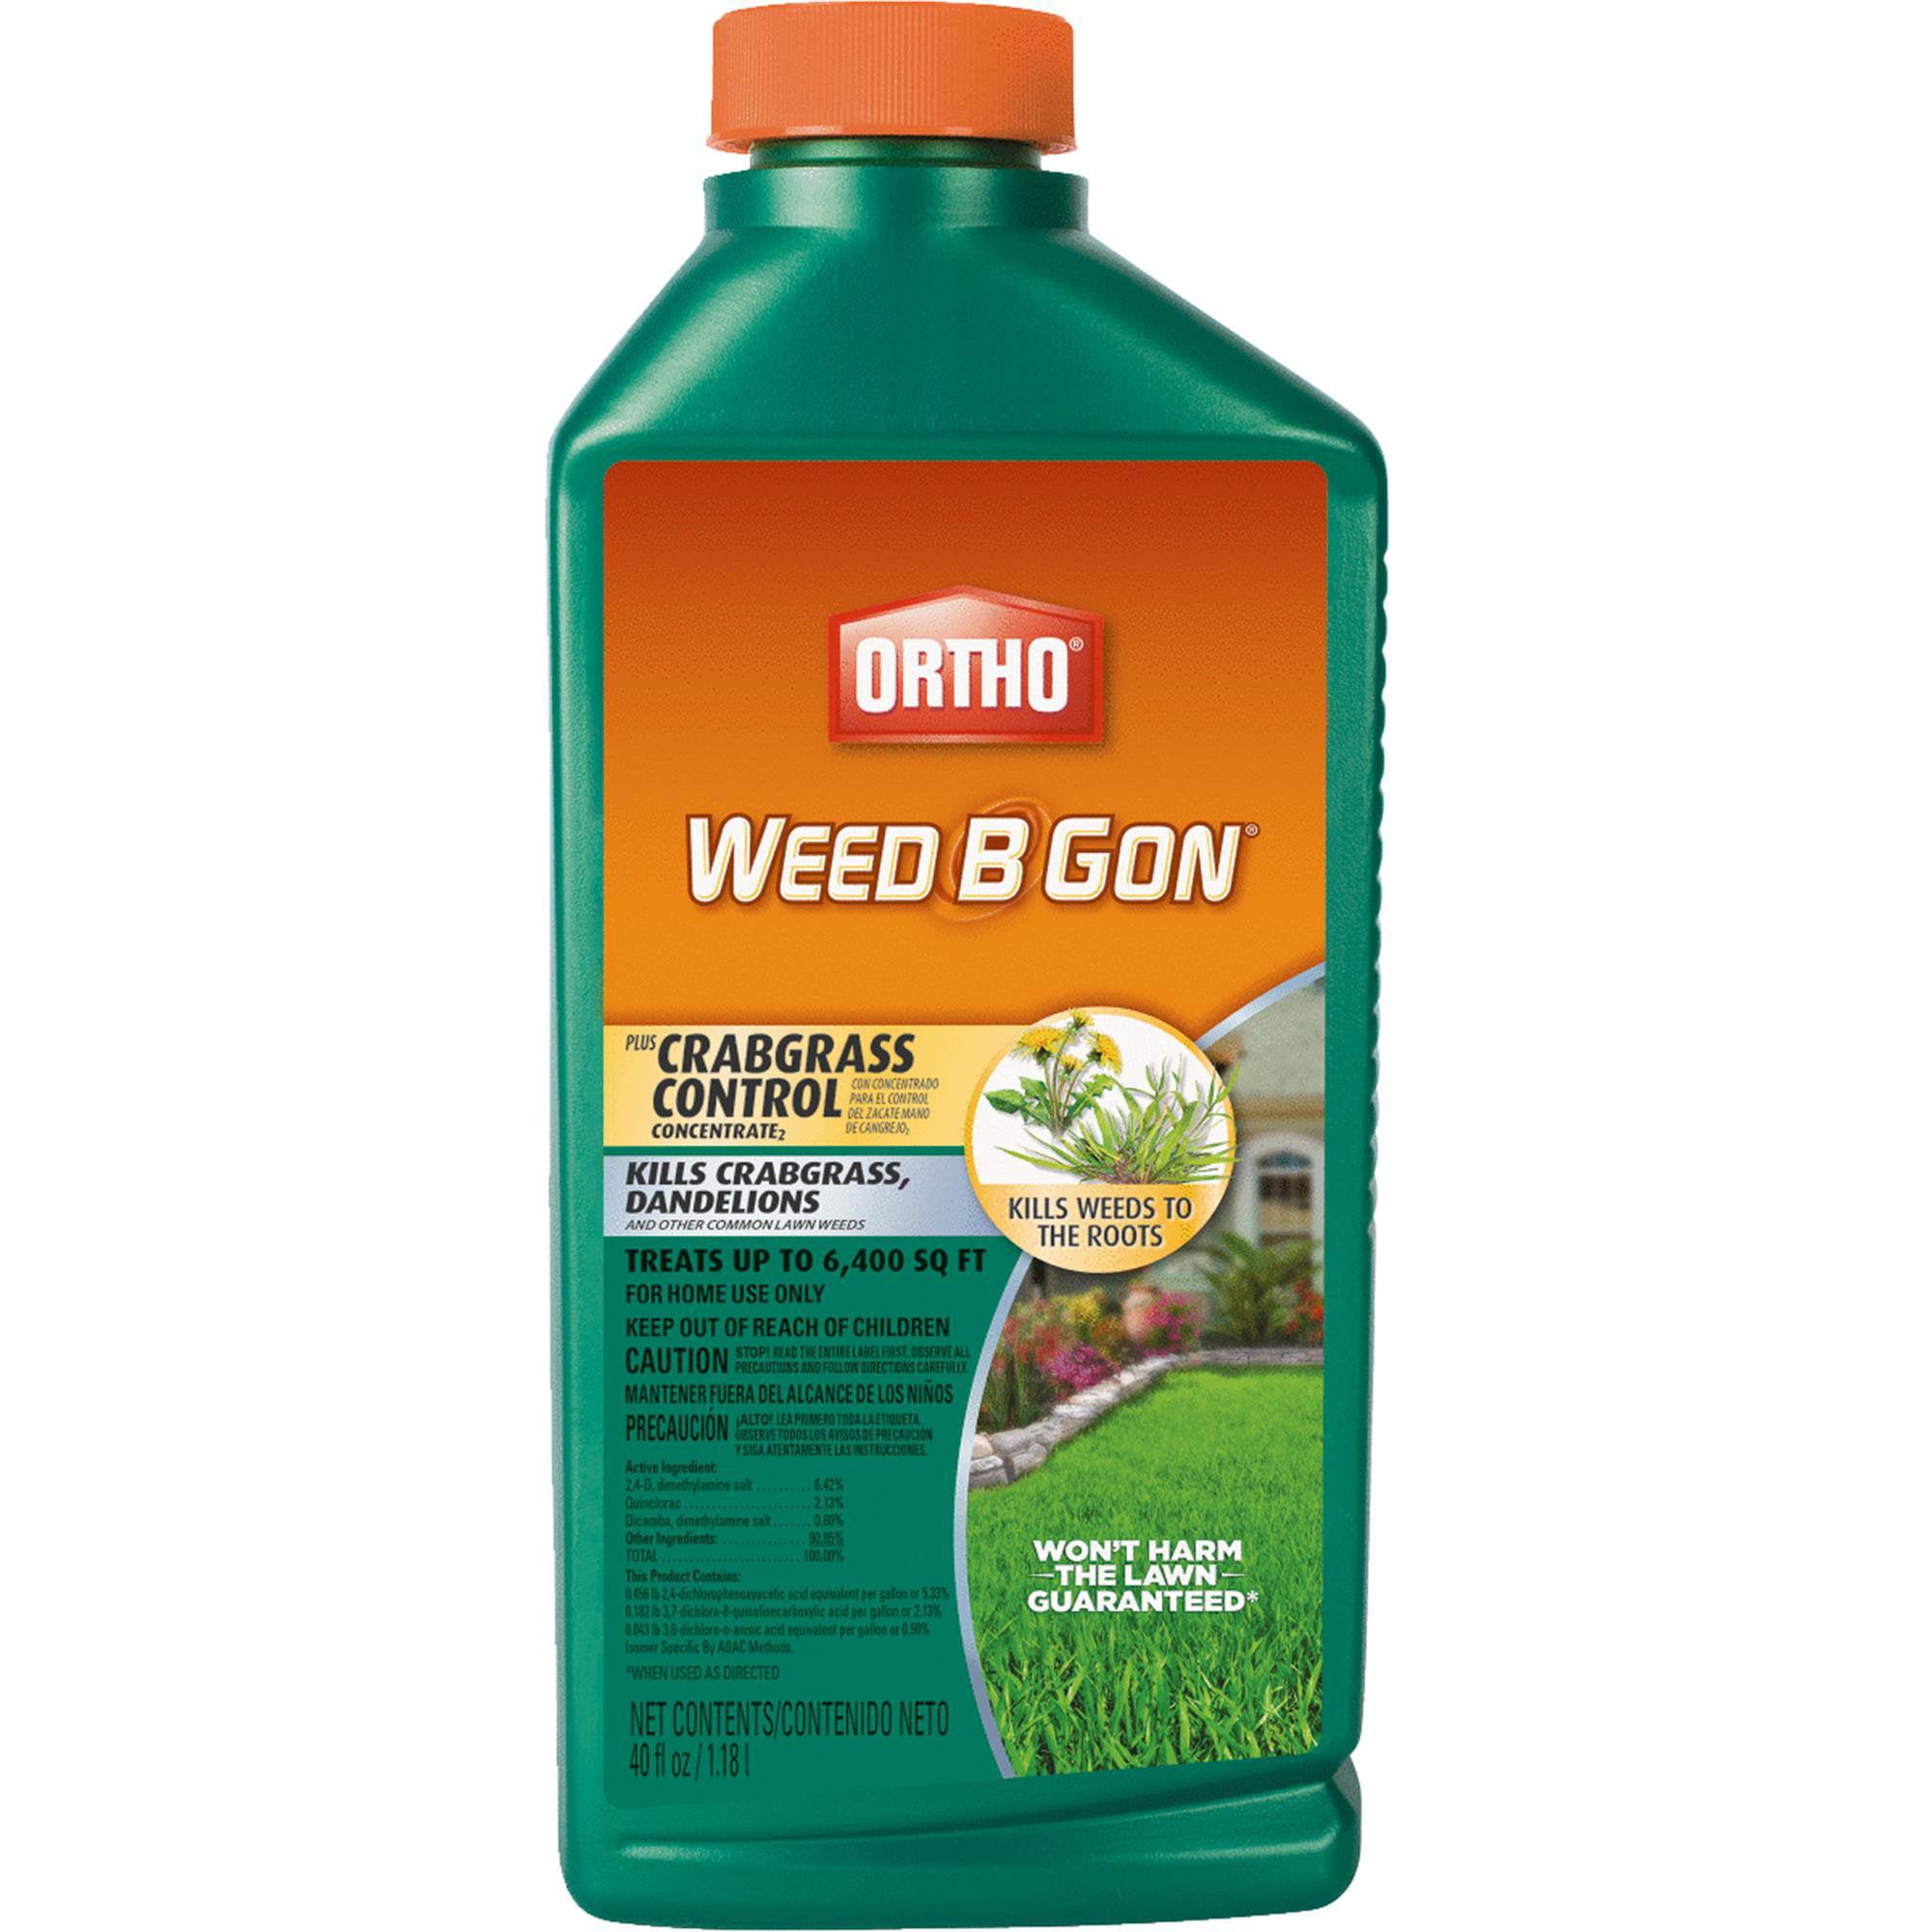 Ortho Weed B Gon Crabgrass & Weed Killer